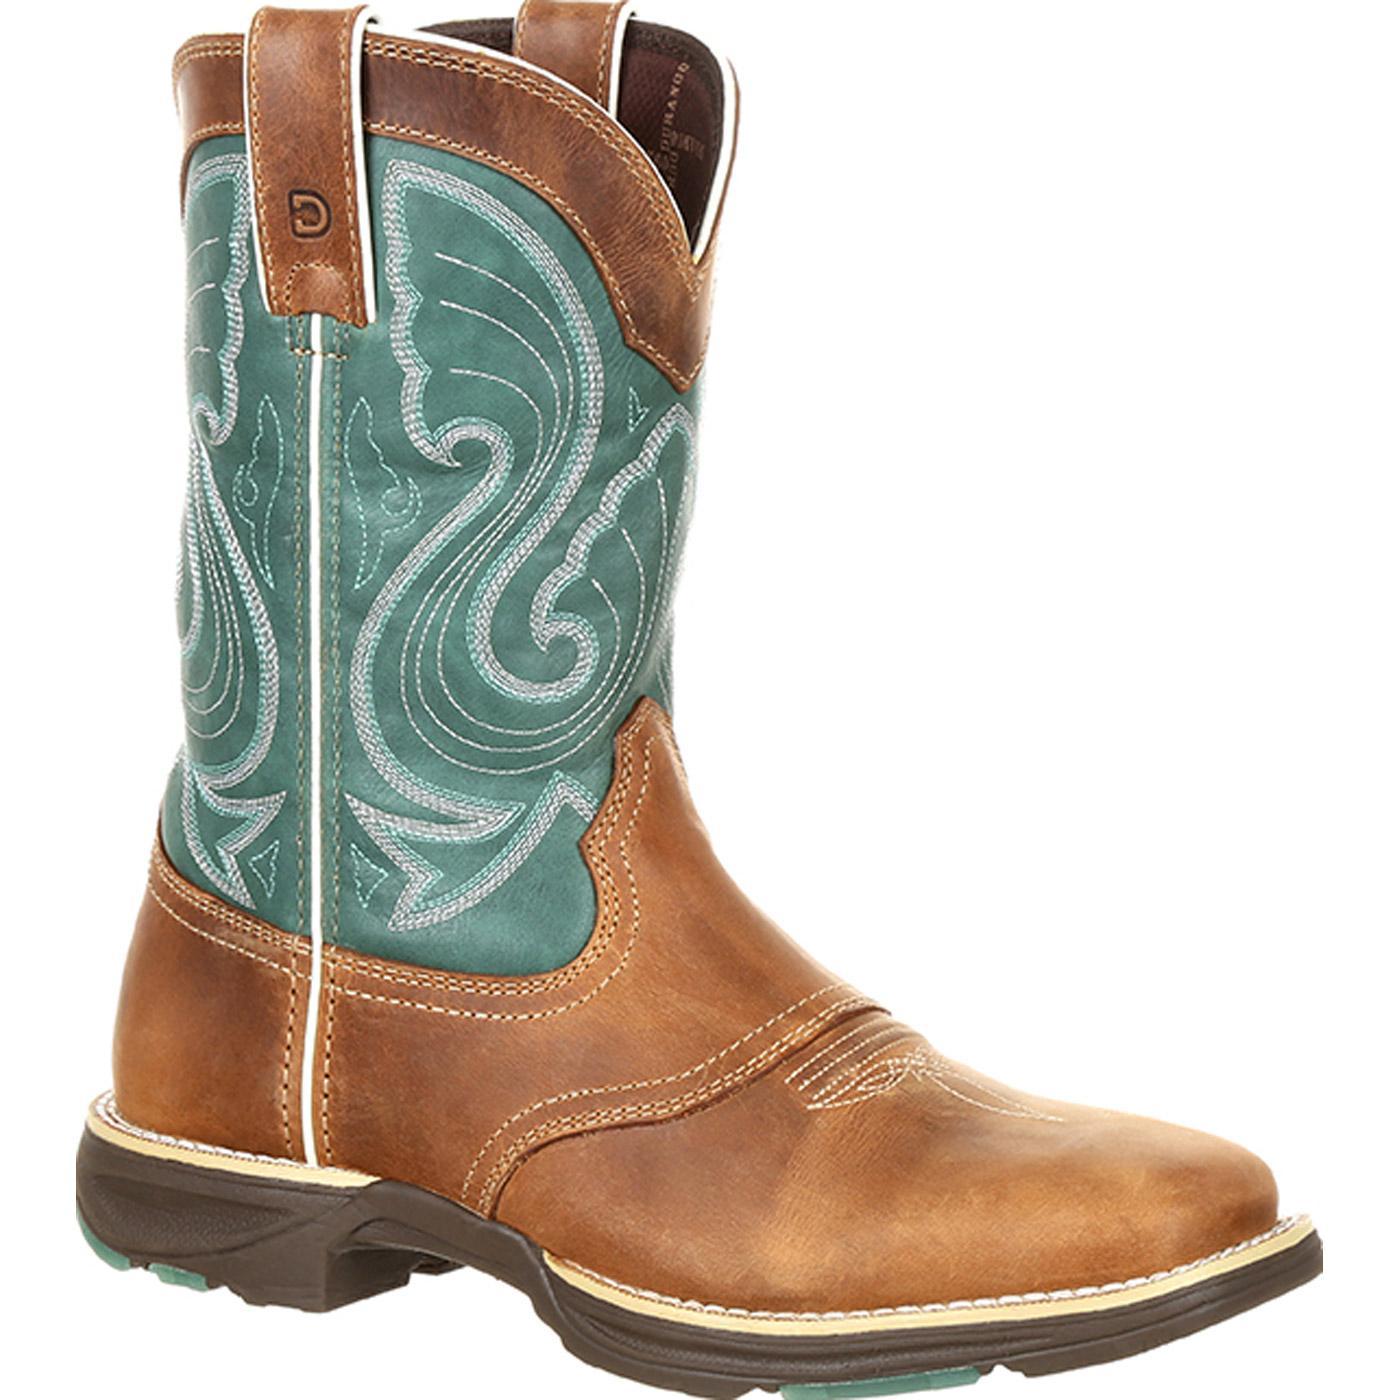 100% authentic 9603b 31f31 Durango® Ultra-Lite™ Women's Emerald Saddle Western Boot